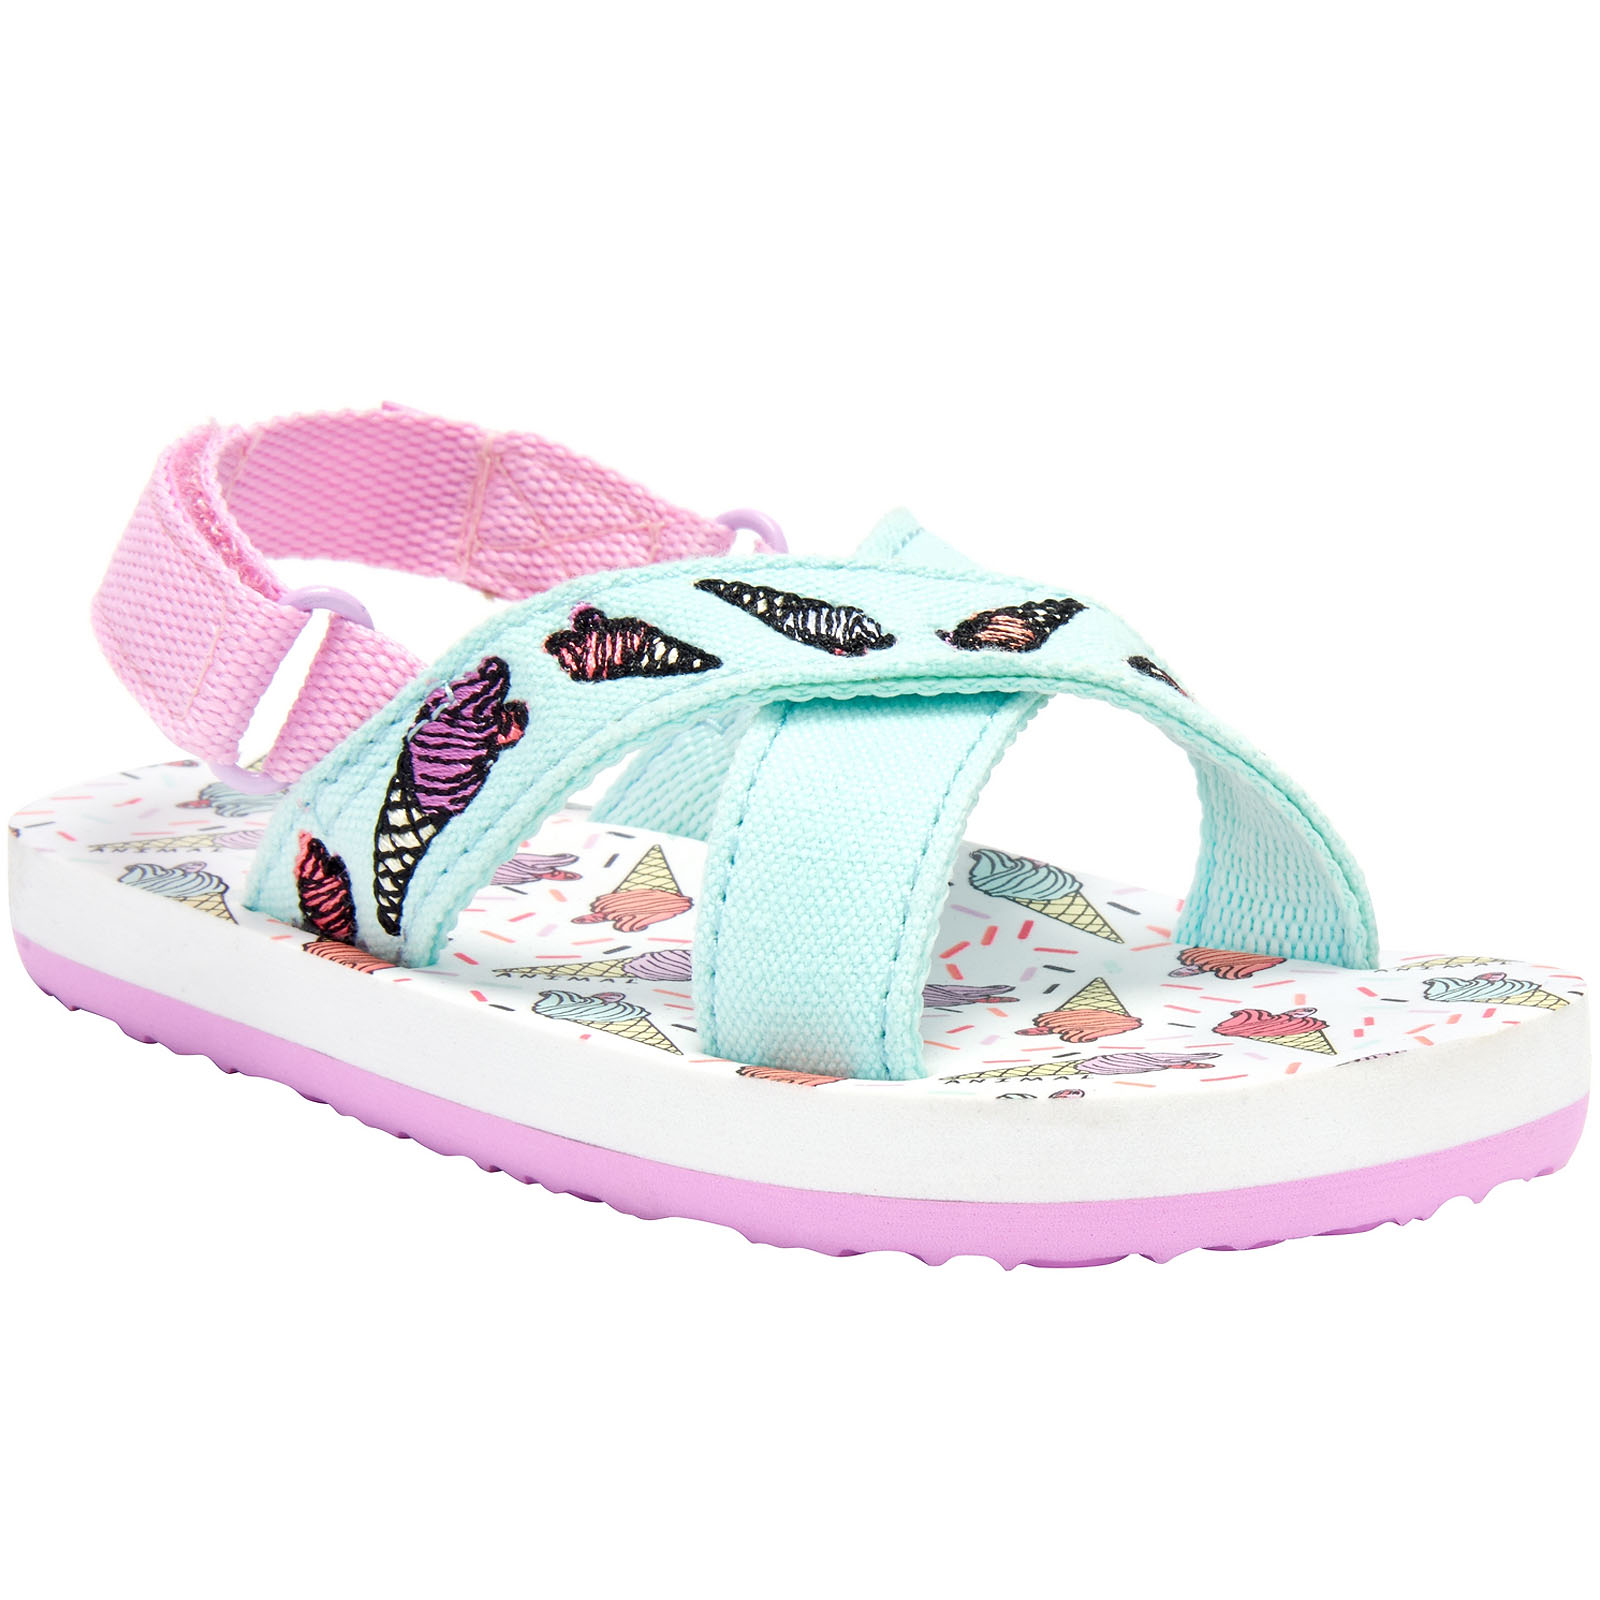 Animal-Girls-Daisie-Kids-Childrens-Beach-Summer-Holiday-Slip-On-Thongs-Sandals miniature 5